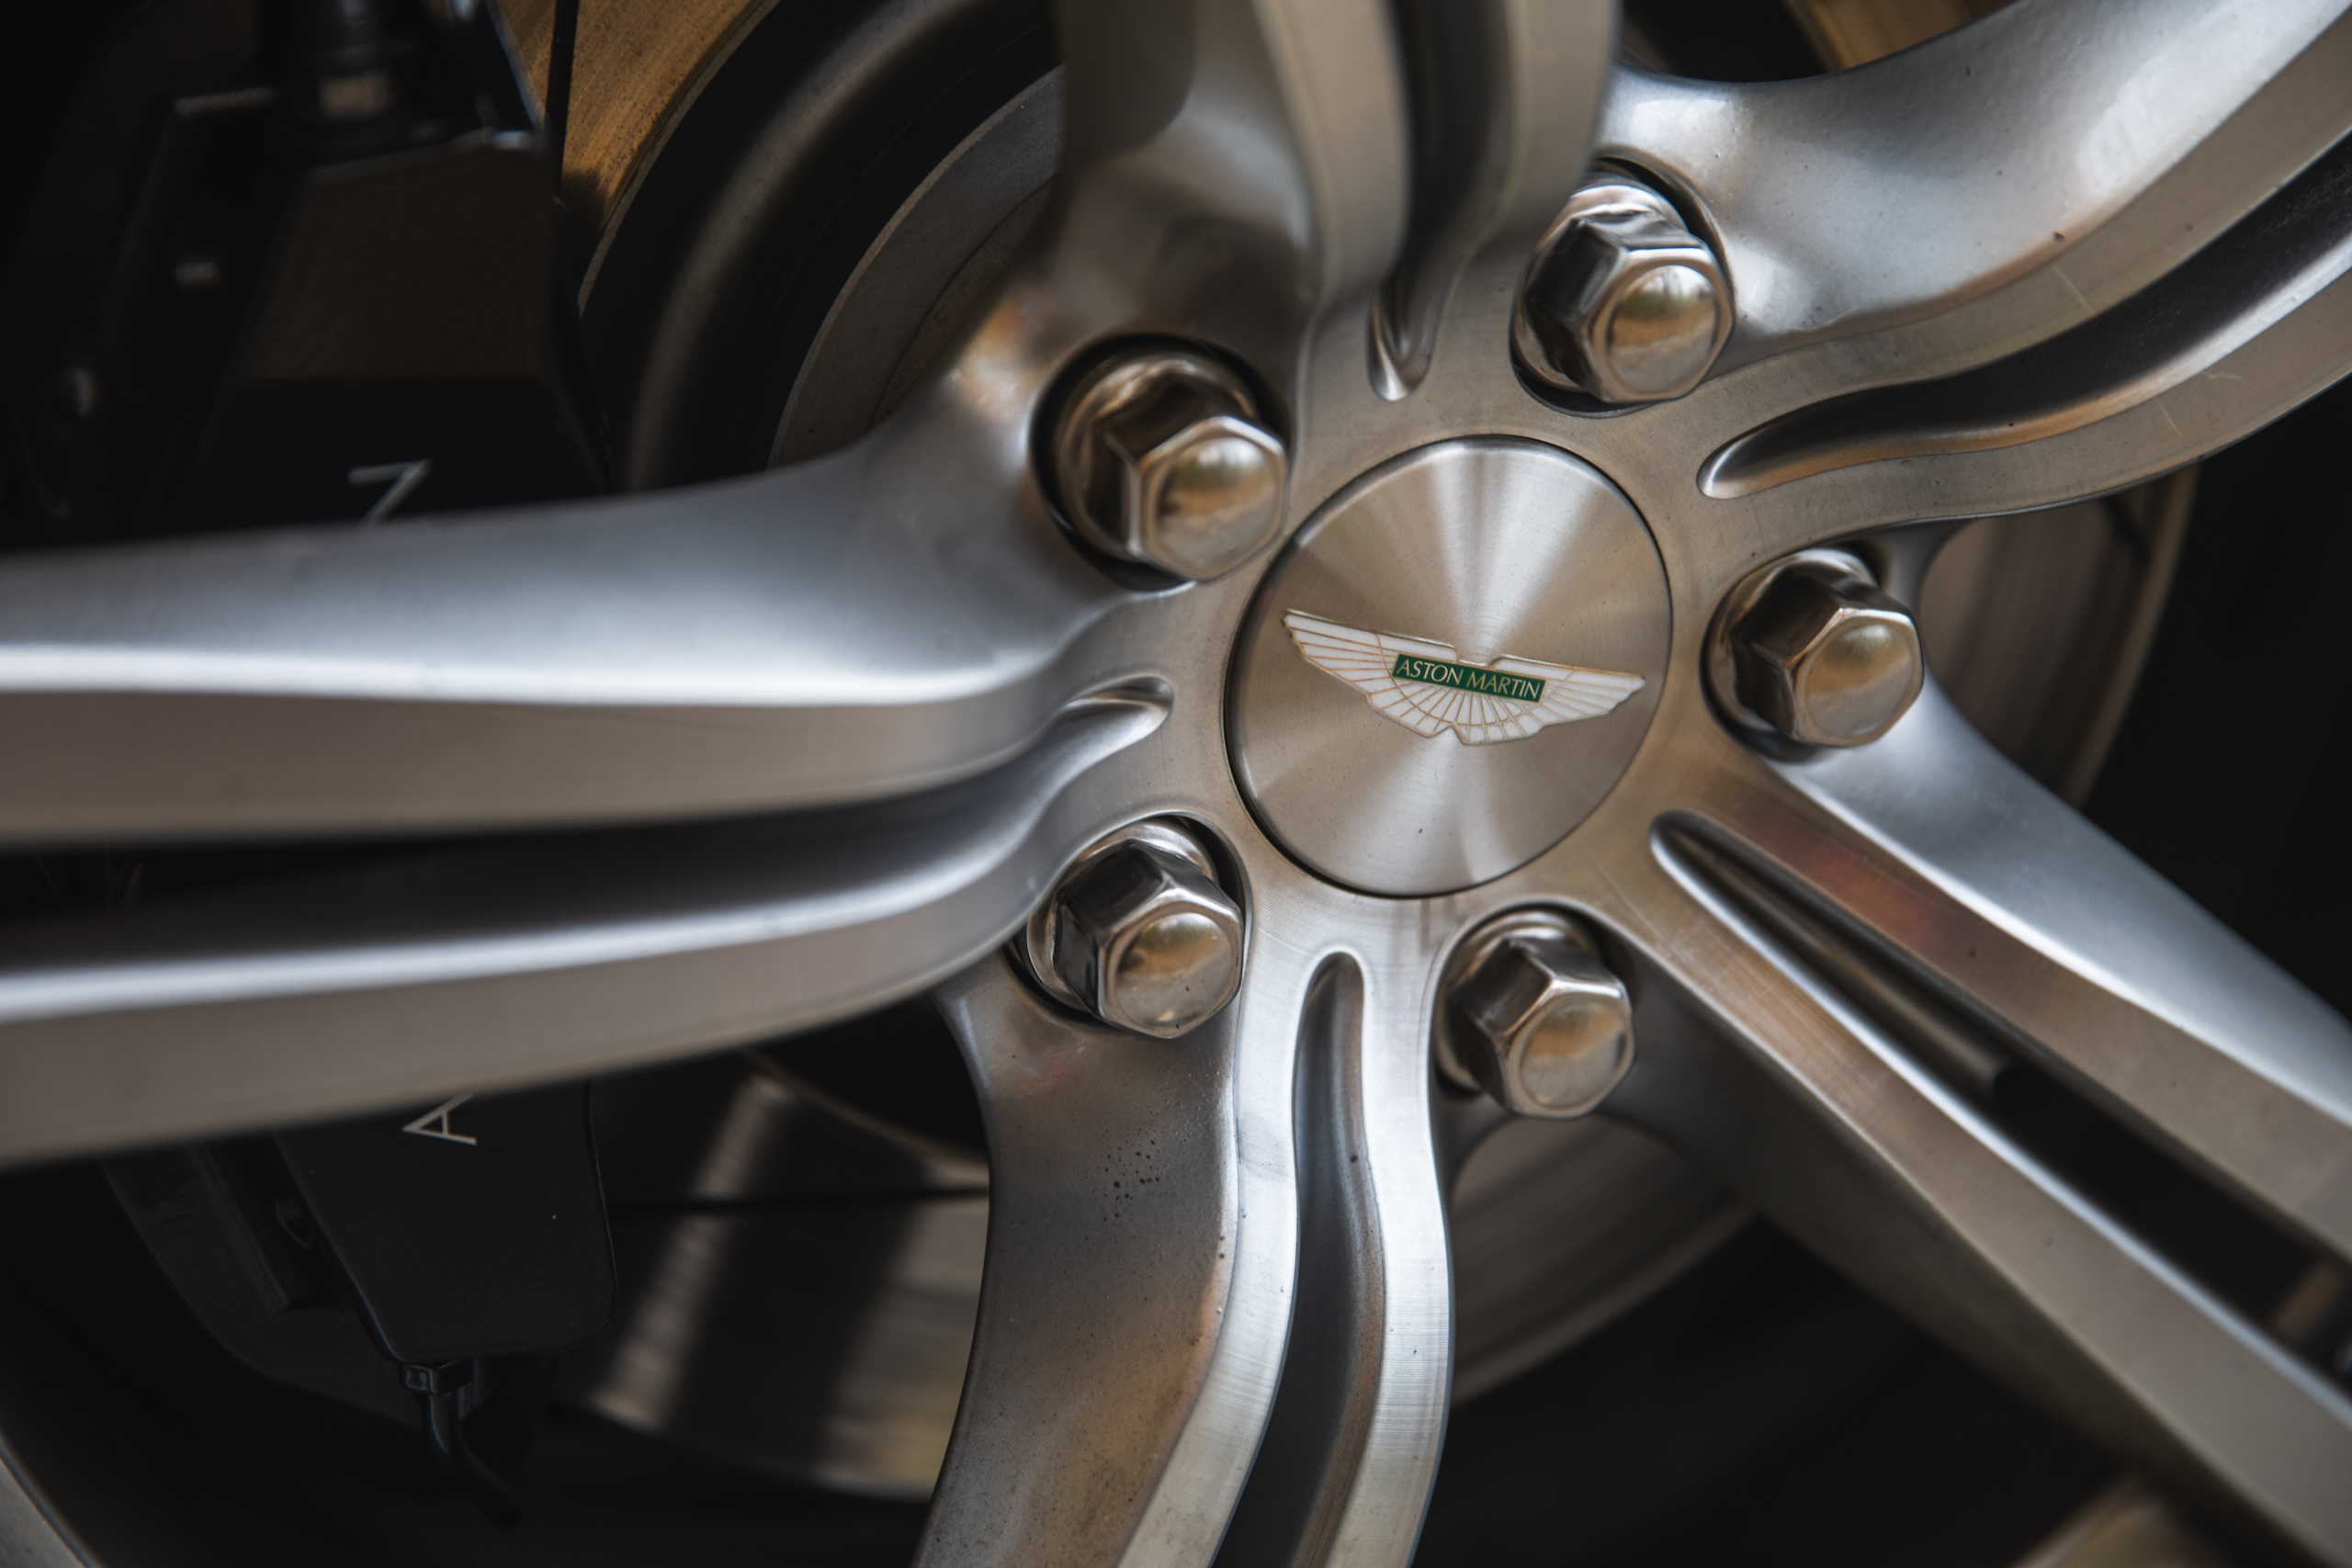 2007 Aston Martin Vantage V8 wheel cap detail